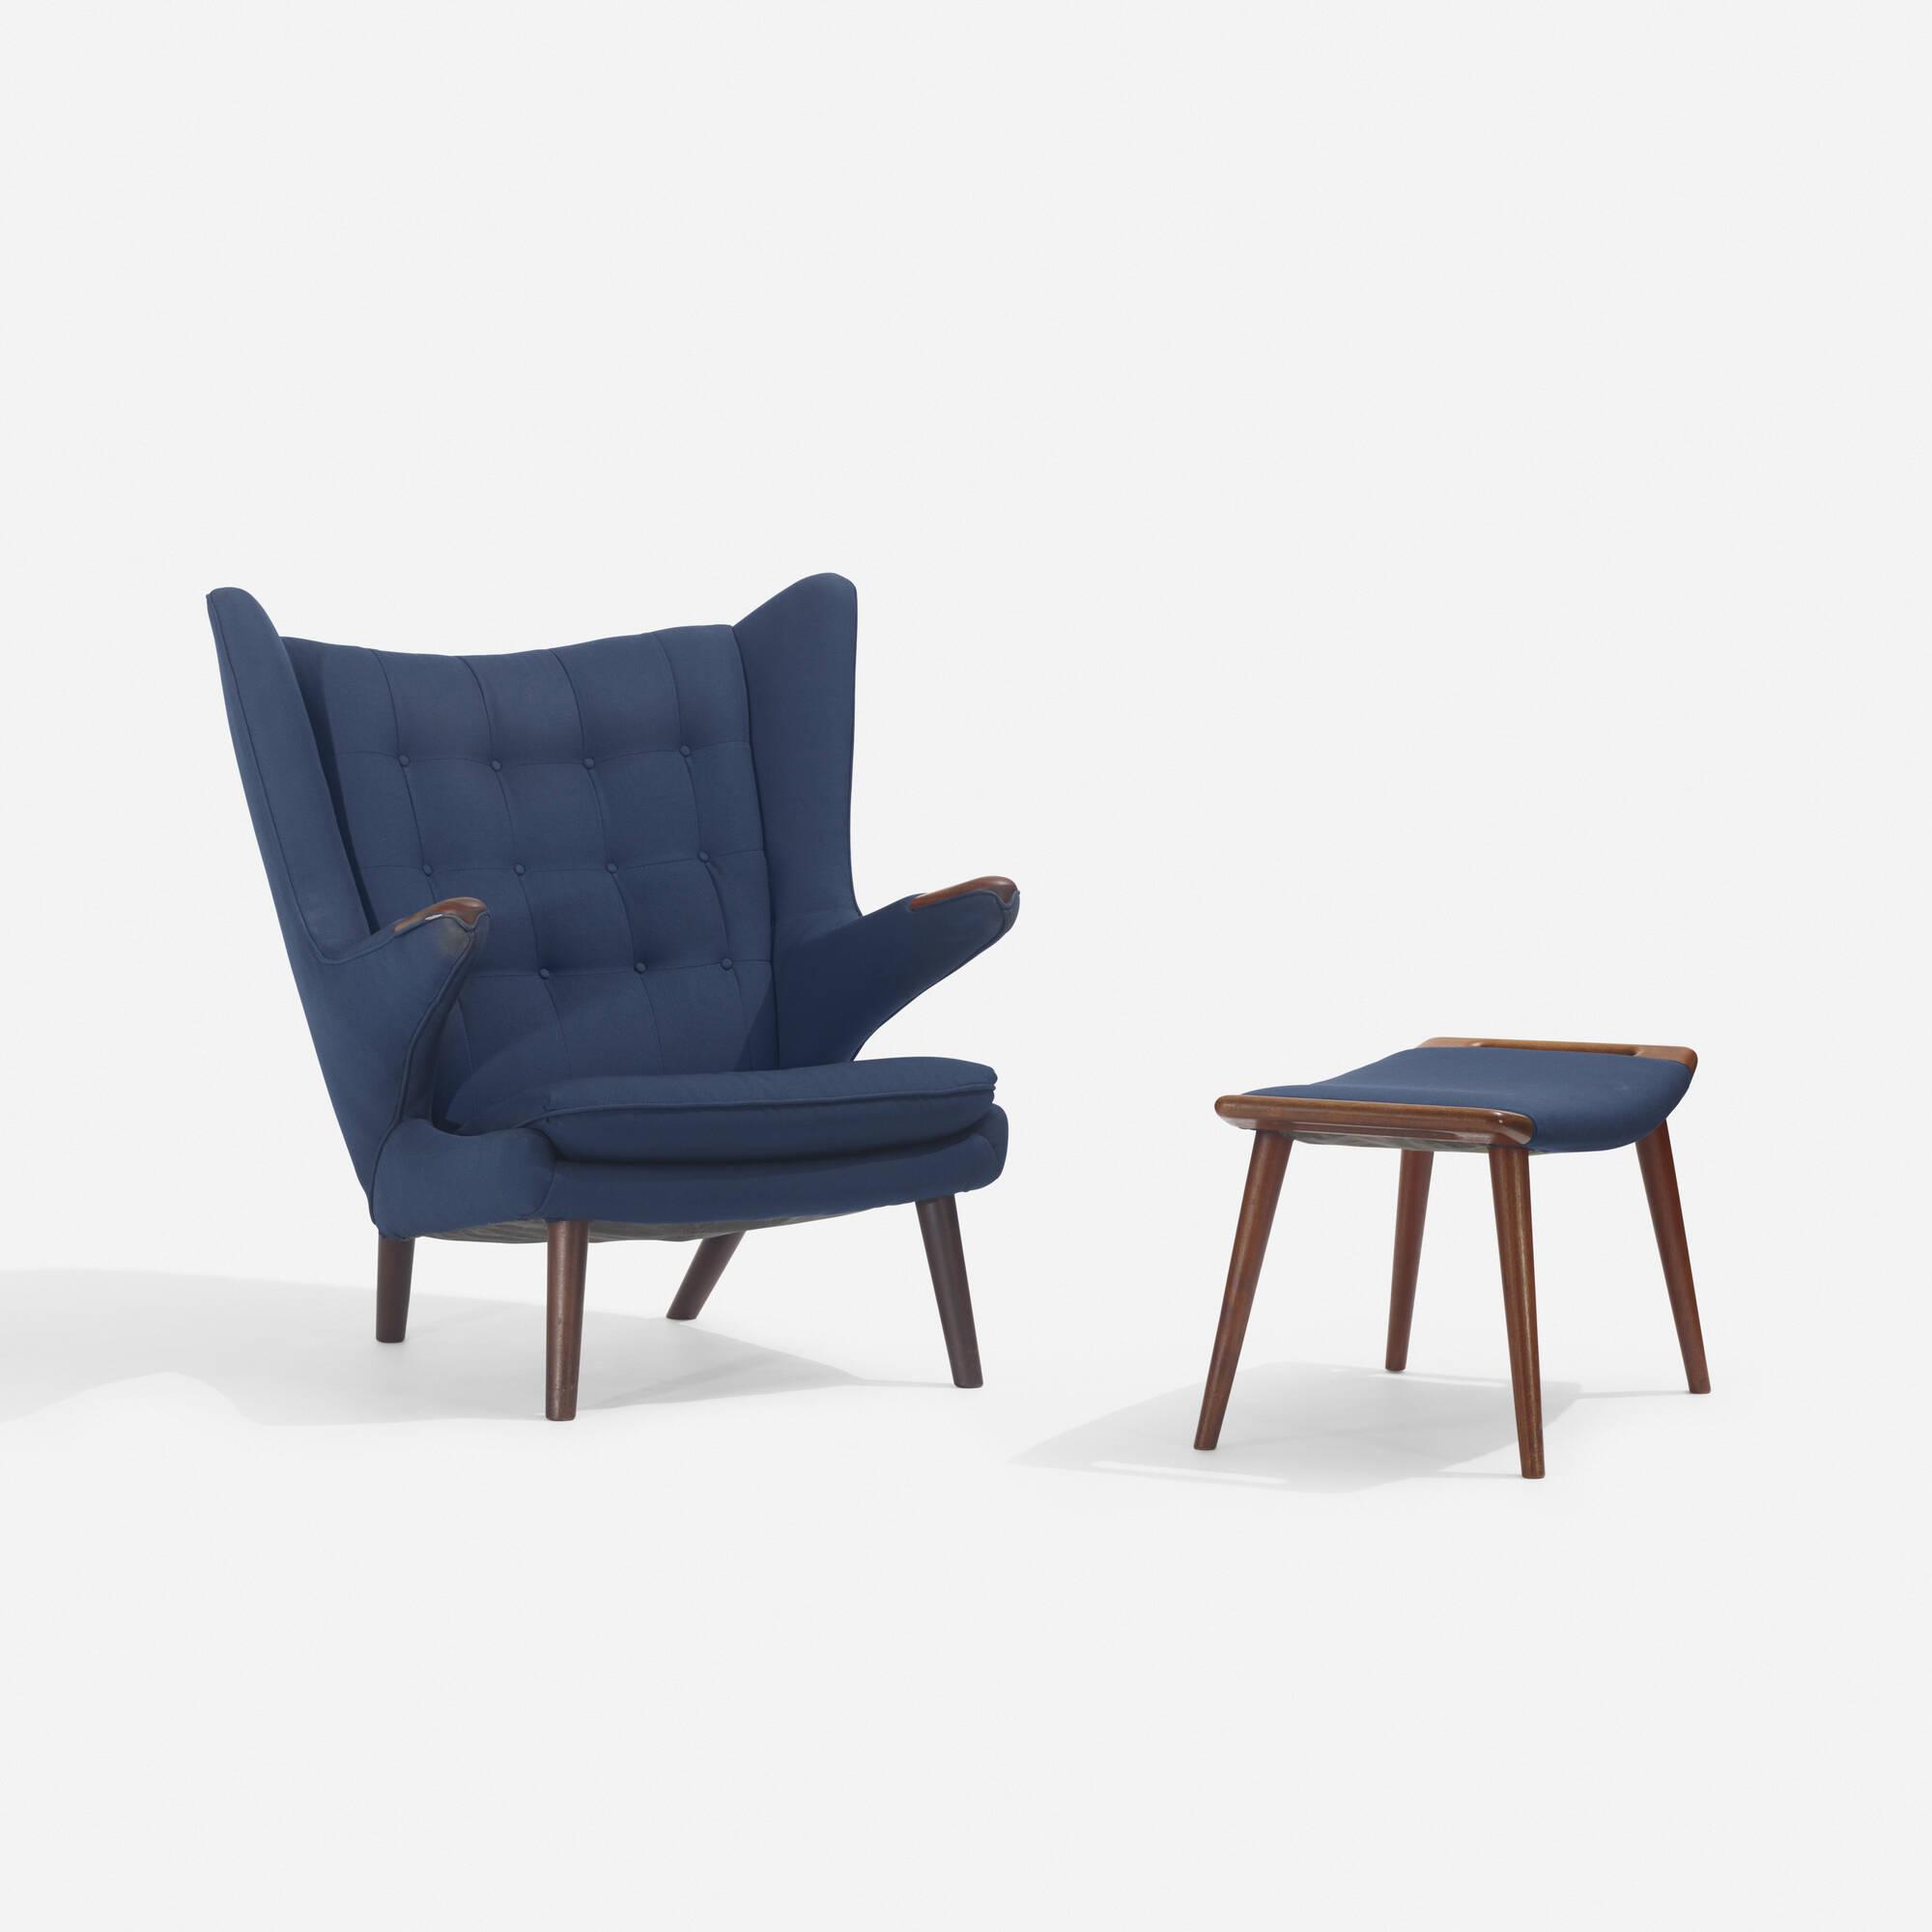 132: Hans J. Wegner / Papa Bear Chair And Ottoman (1 Of 3